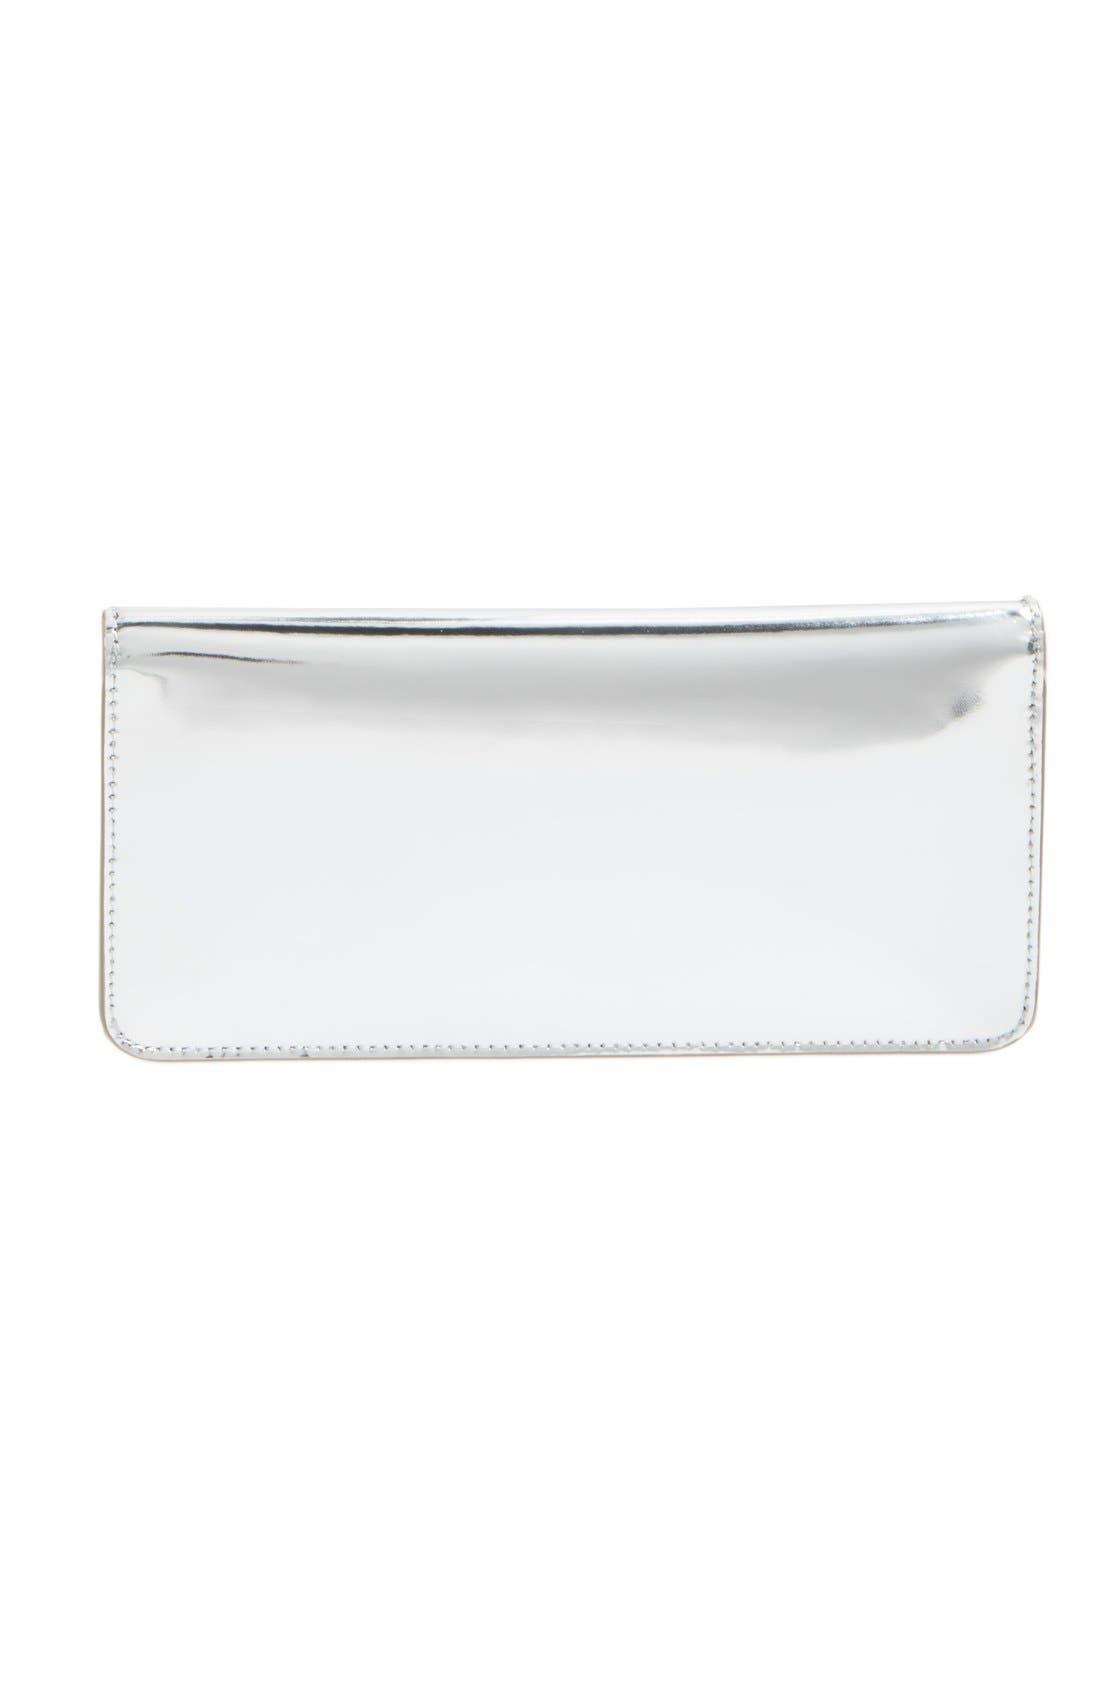 Gigi Metallic Leather Clutch,                             Alternate thumbnail 3, color,                             Silver Leather Standard